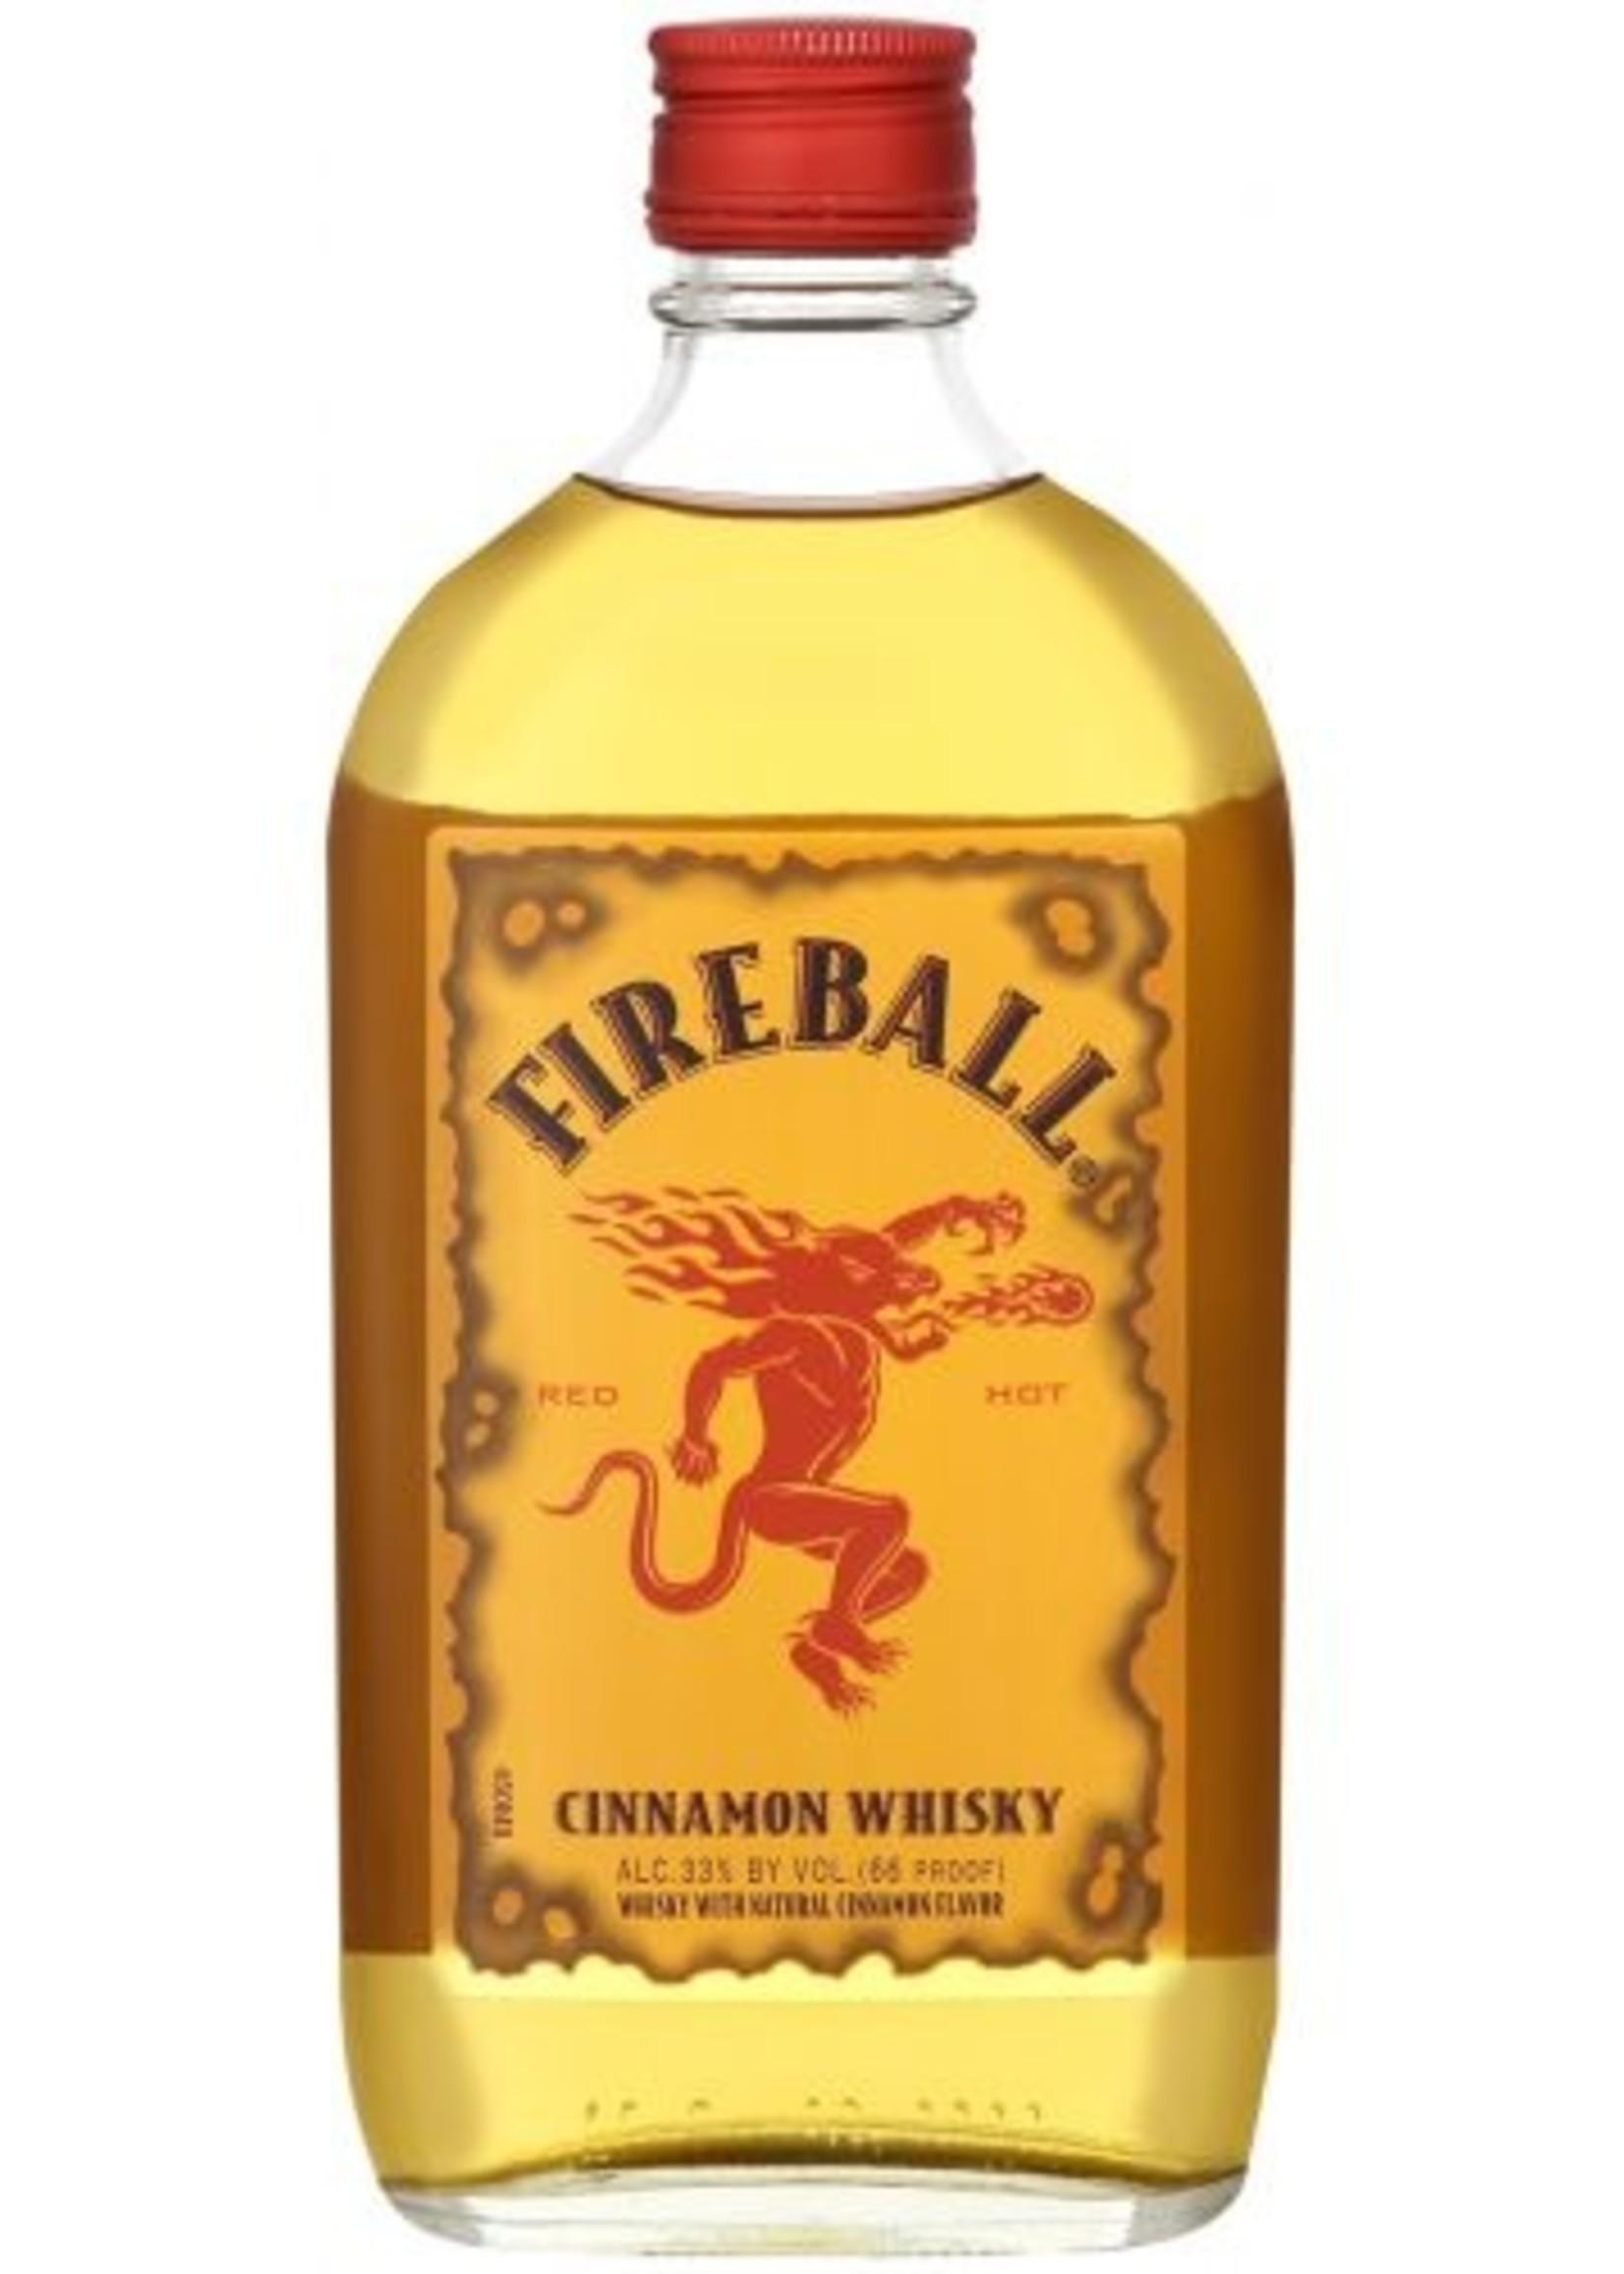 Fireball Cinnamon Whiskey 375